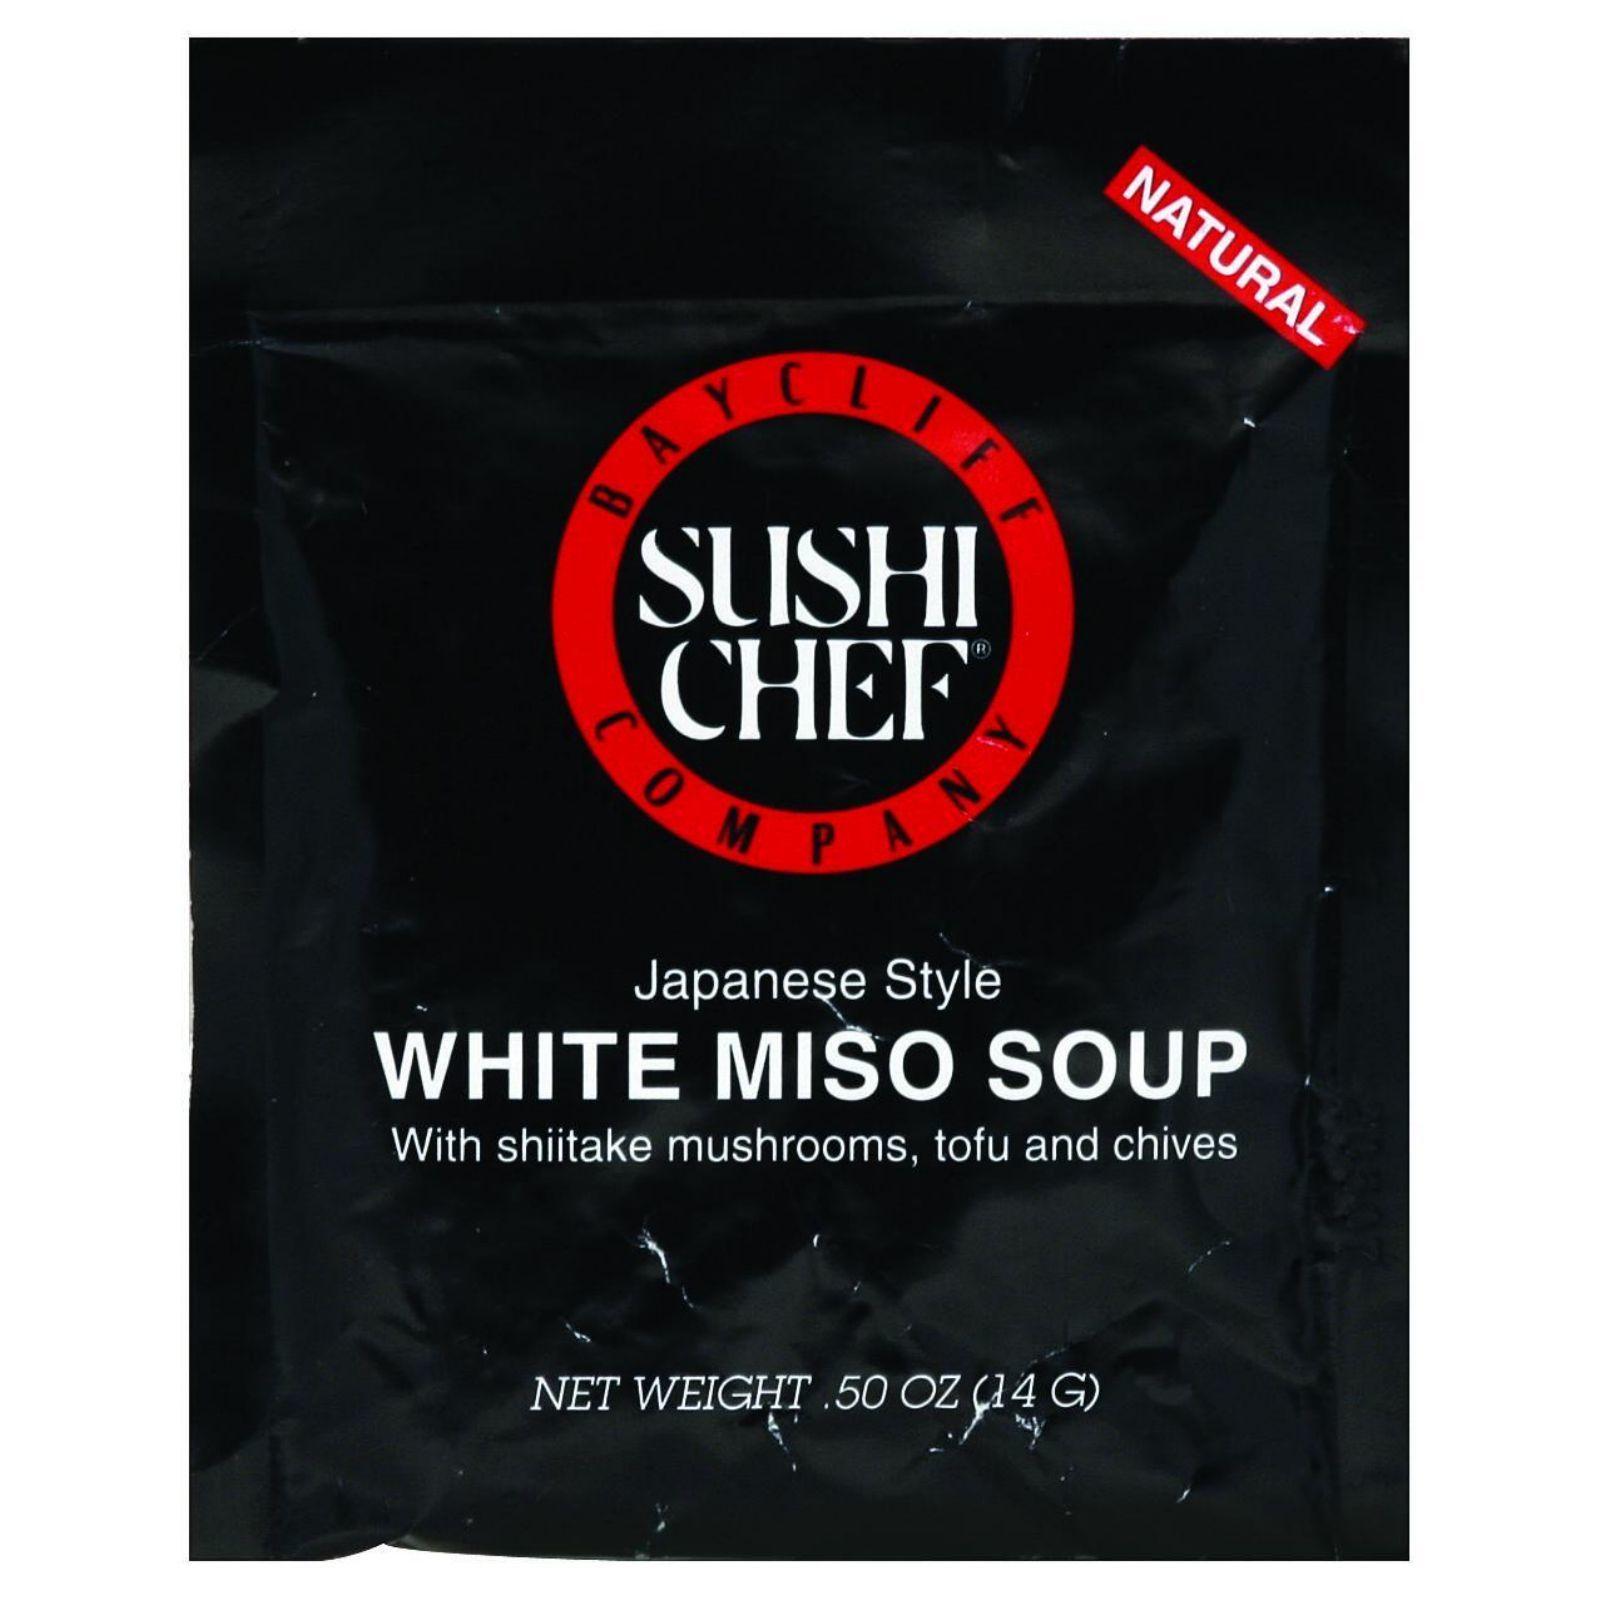 Sushi Chef Soup Mix - Miso White - .5 oz - Case of 12